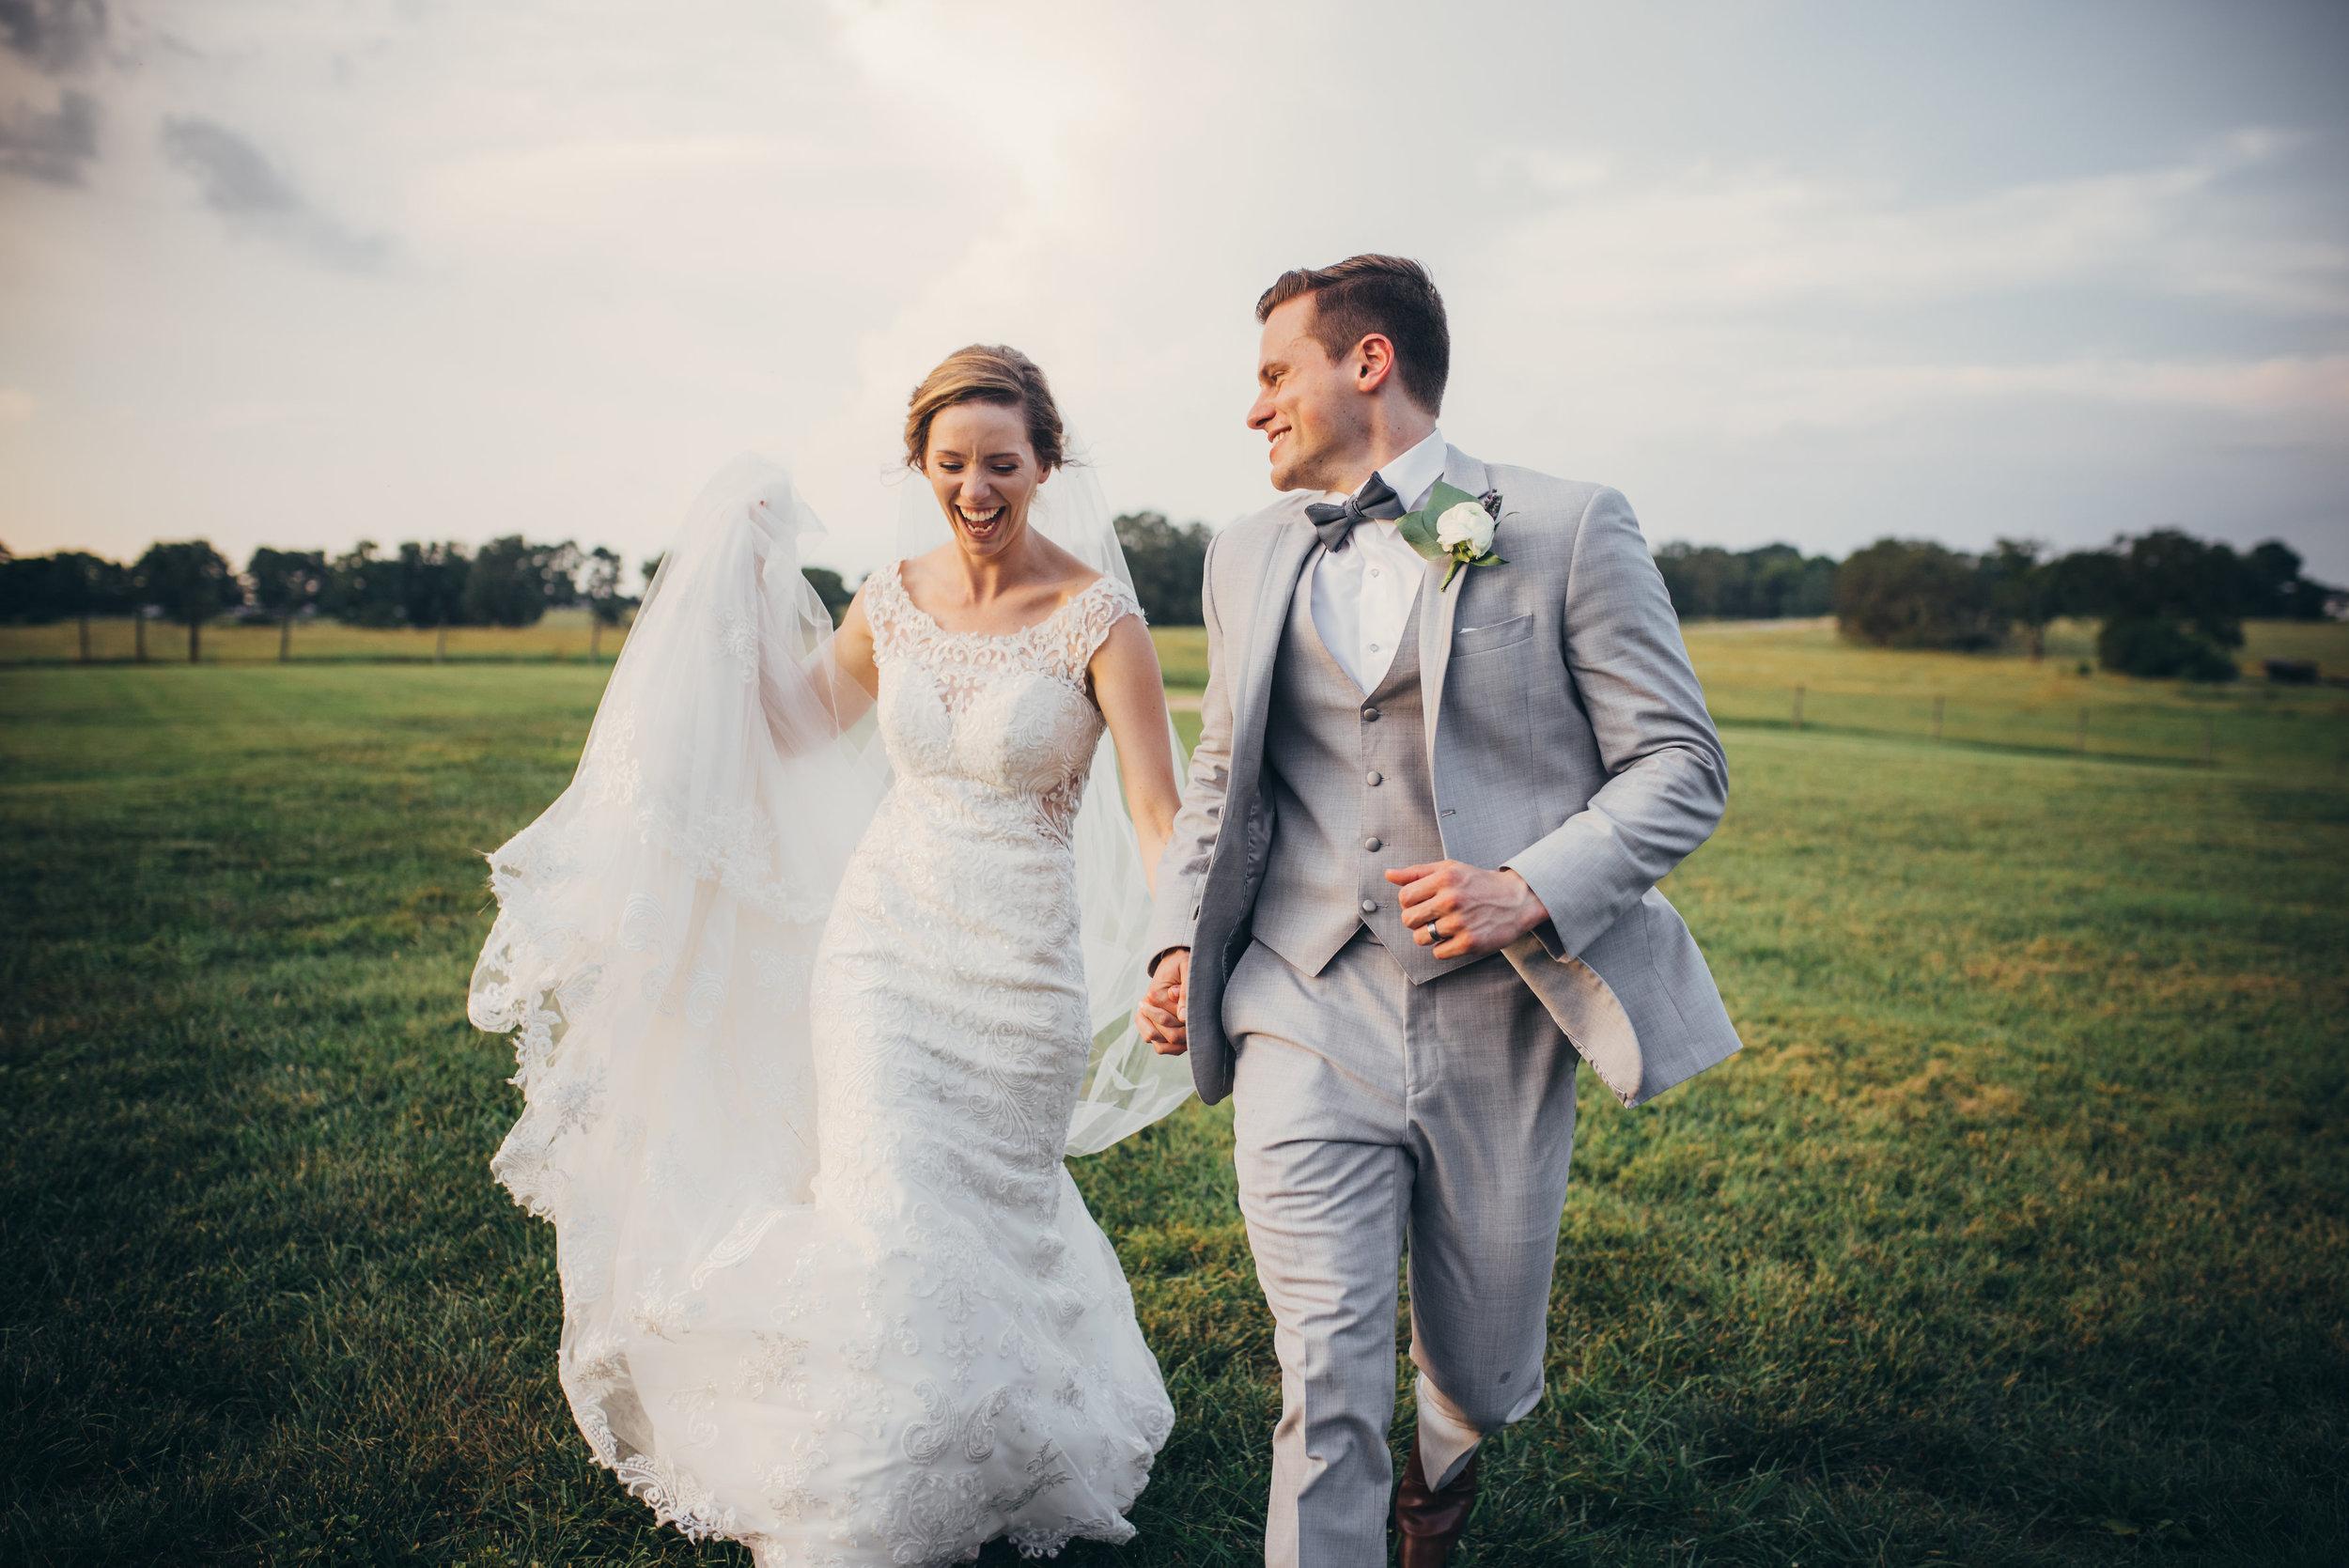 rose hill plantation wedding - north carolina wedding photographer - raleigh wedding photographer